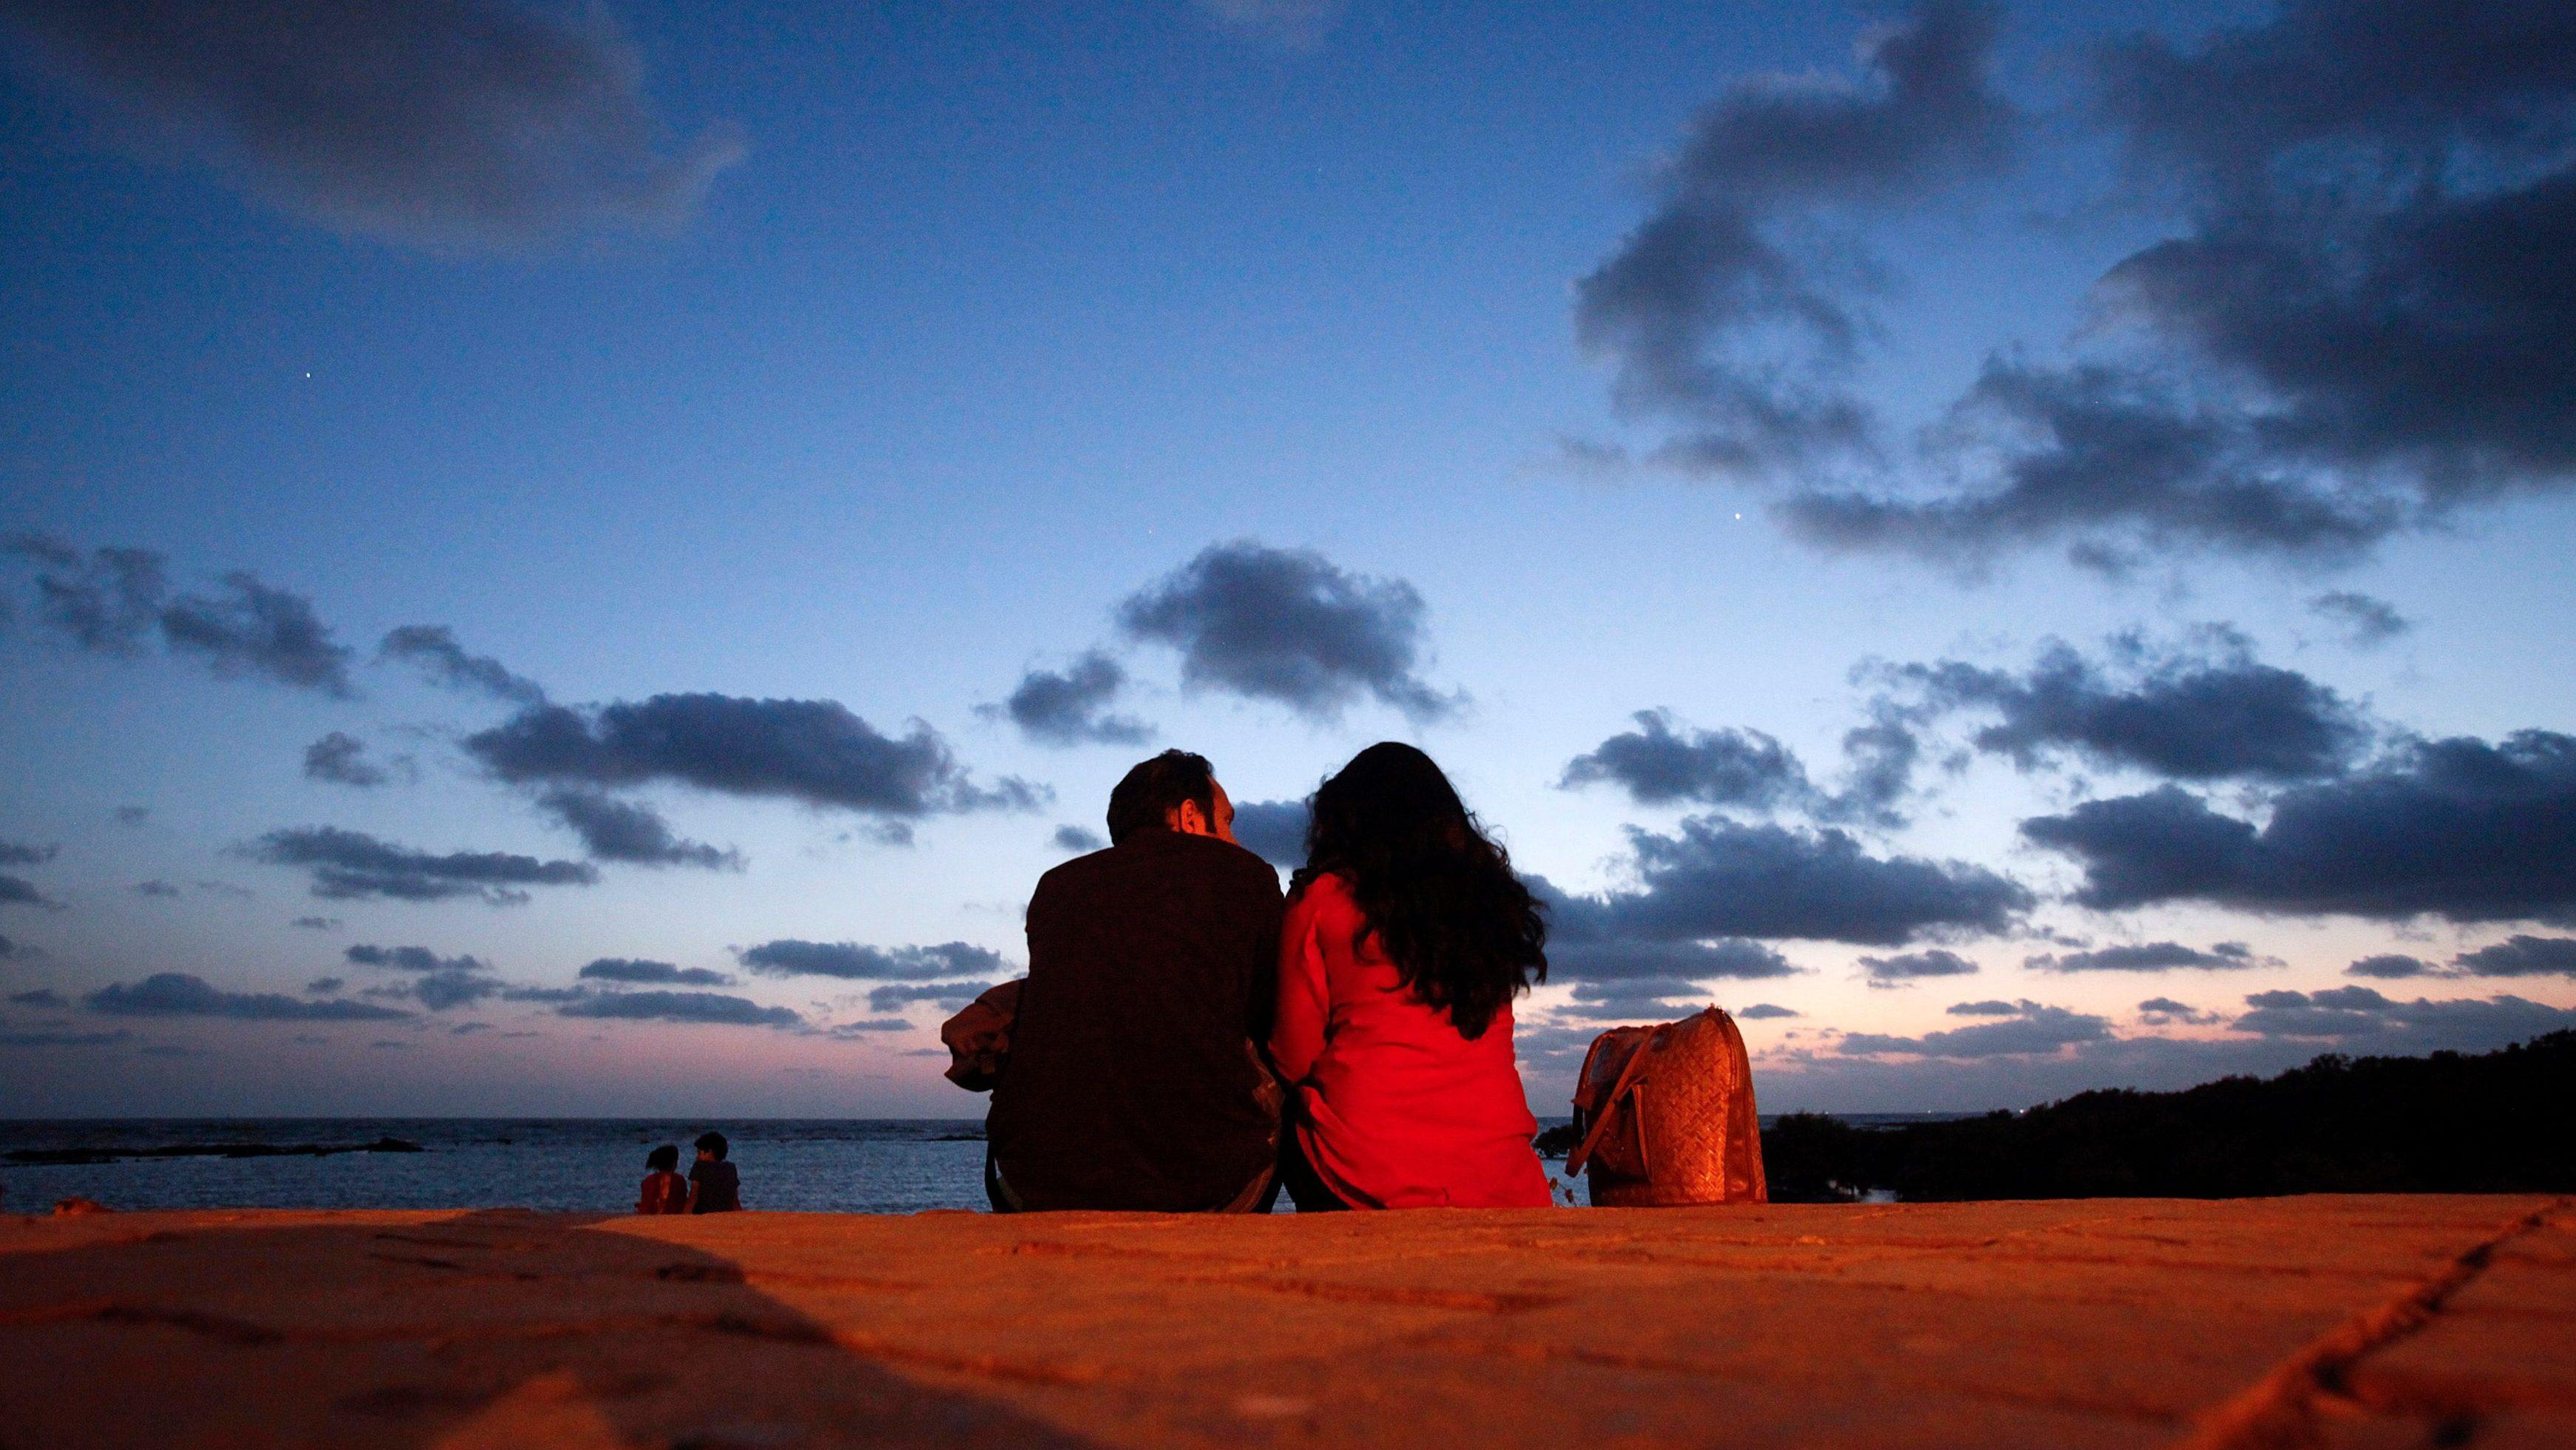 Top εφαρμογές dating στην Ινδία 2016 τυφλή dating kinox